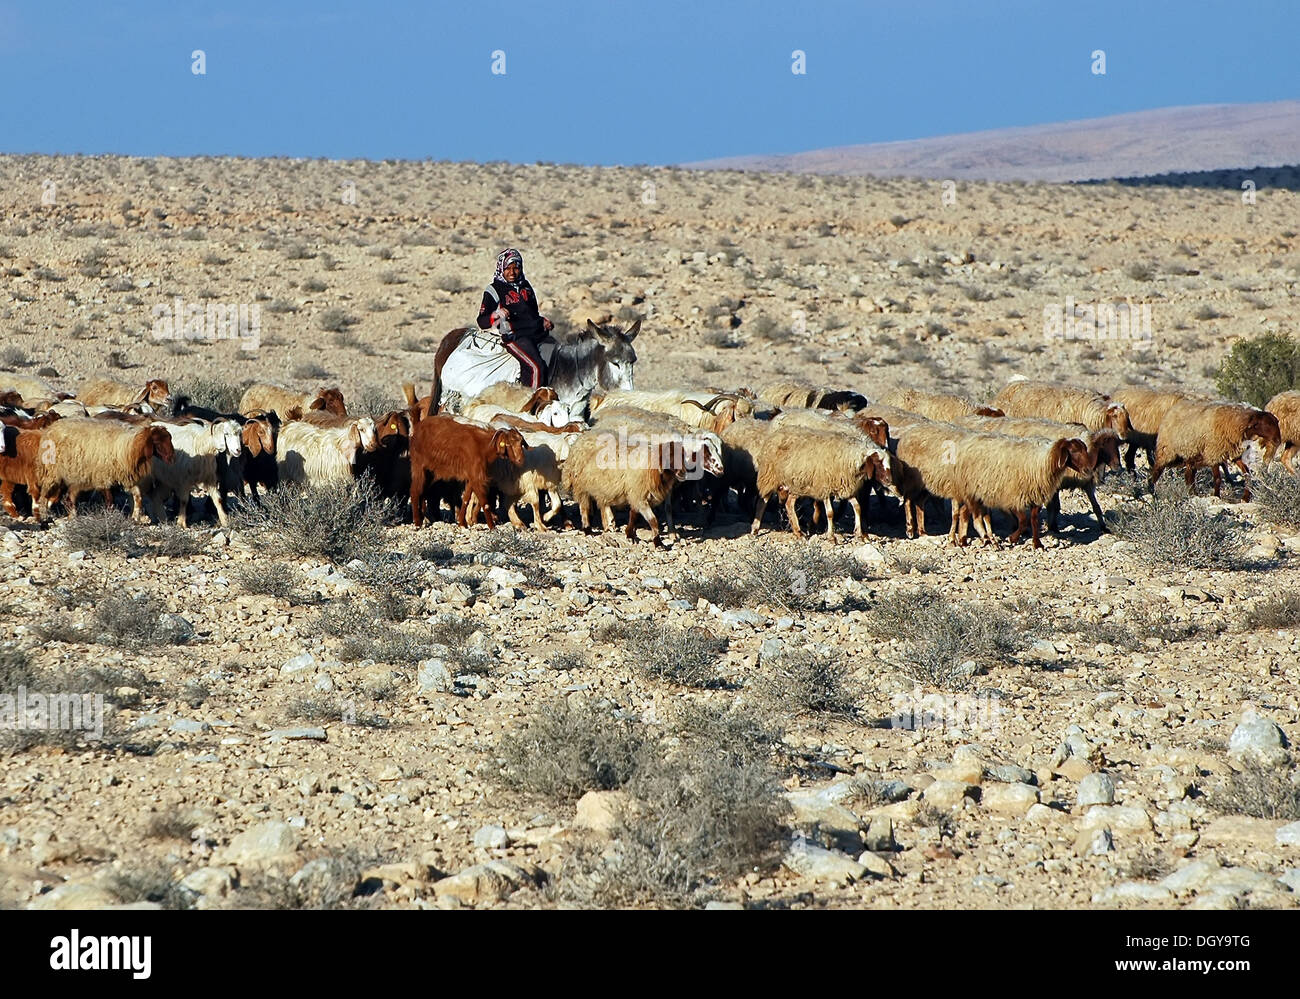 Bedouin Shepard girl ride a donkey in the Negev, Israel - Stock Image